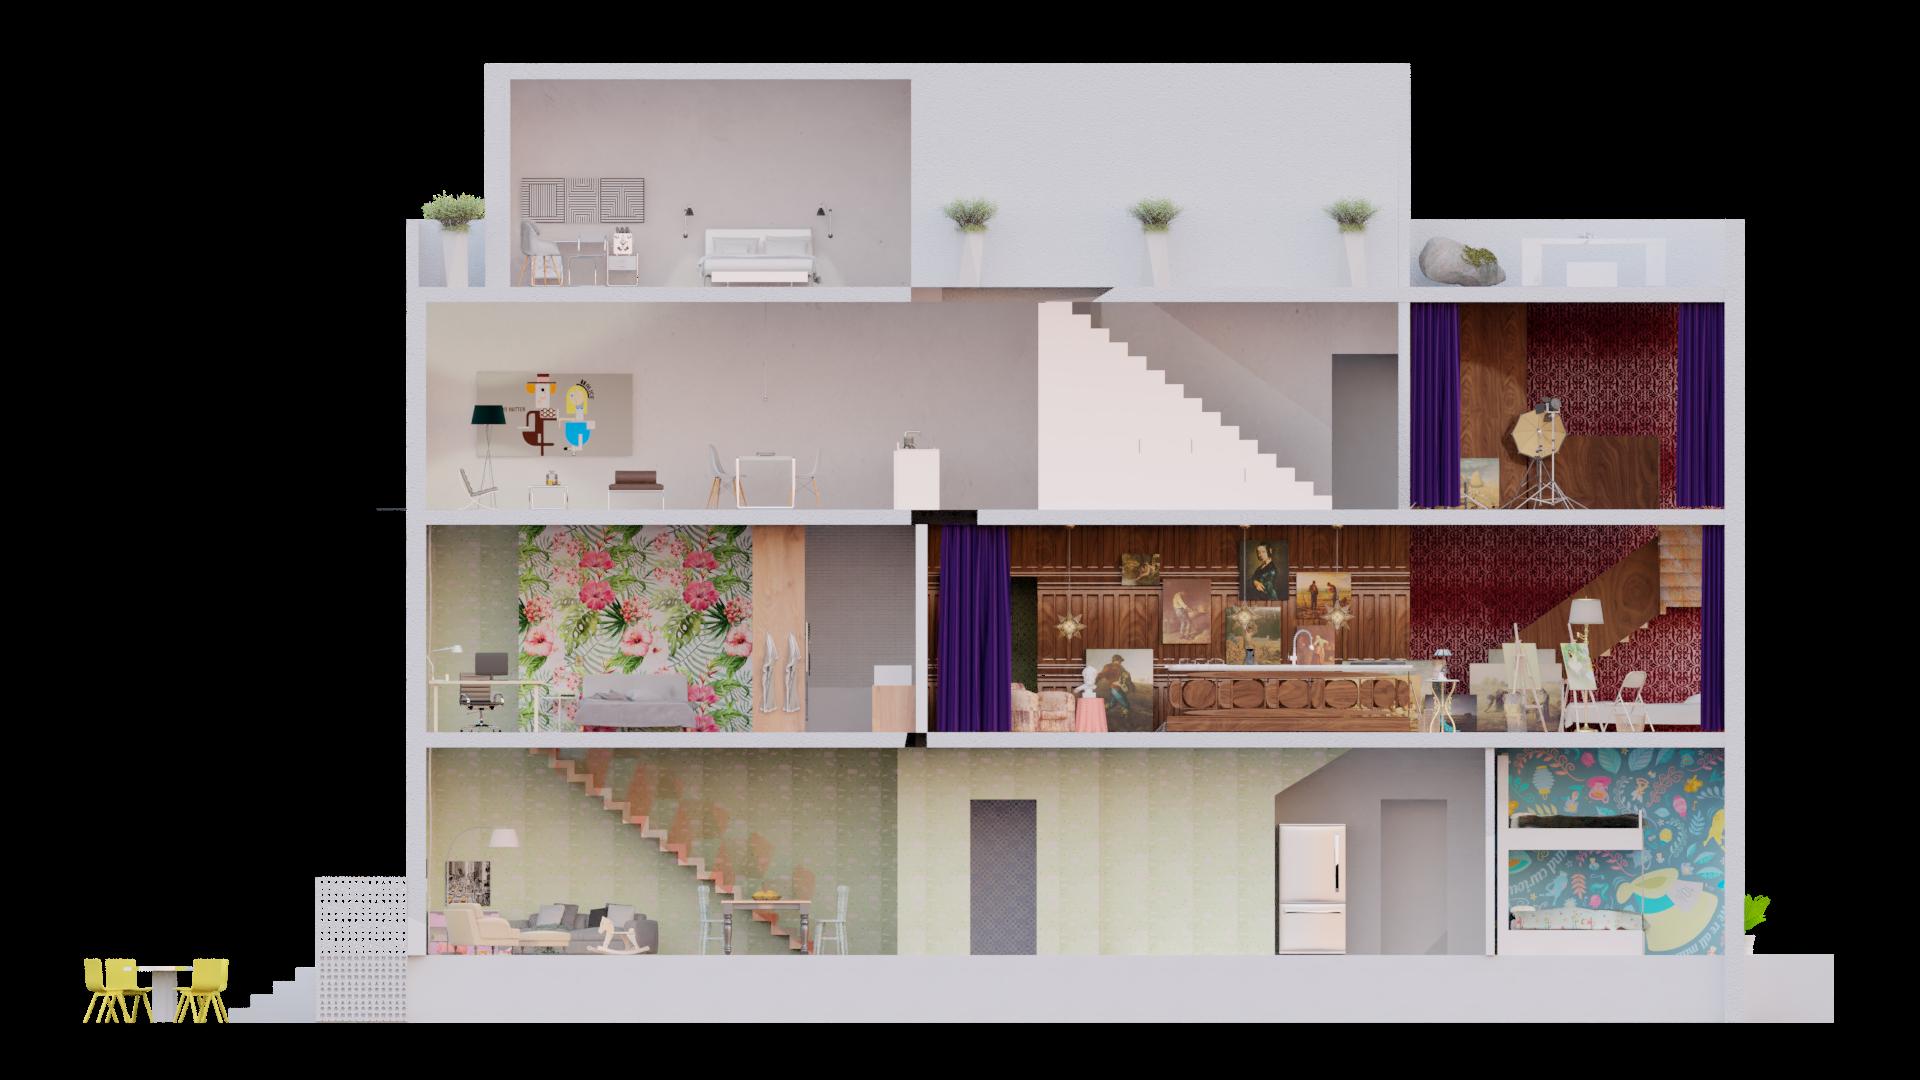 //Multi-Family Micro Housing //2018 //Residential